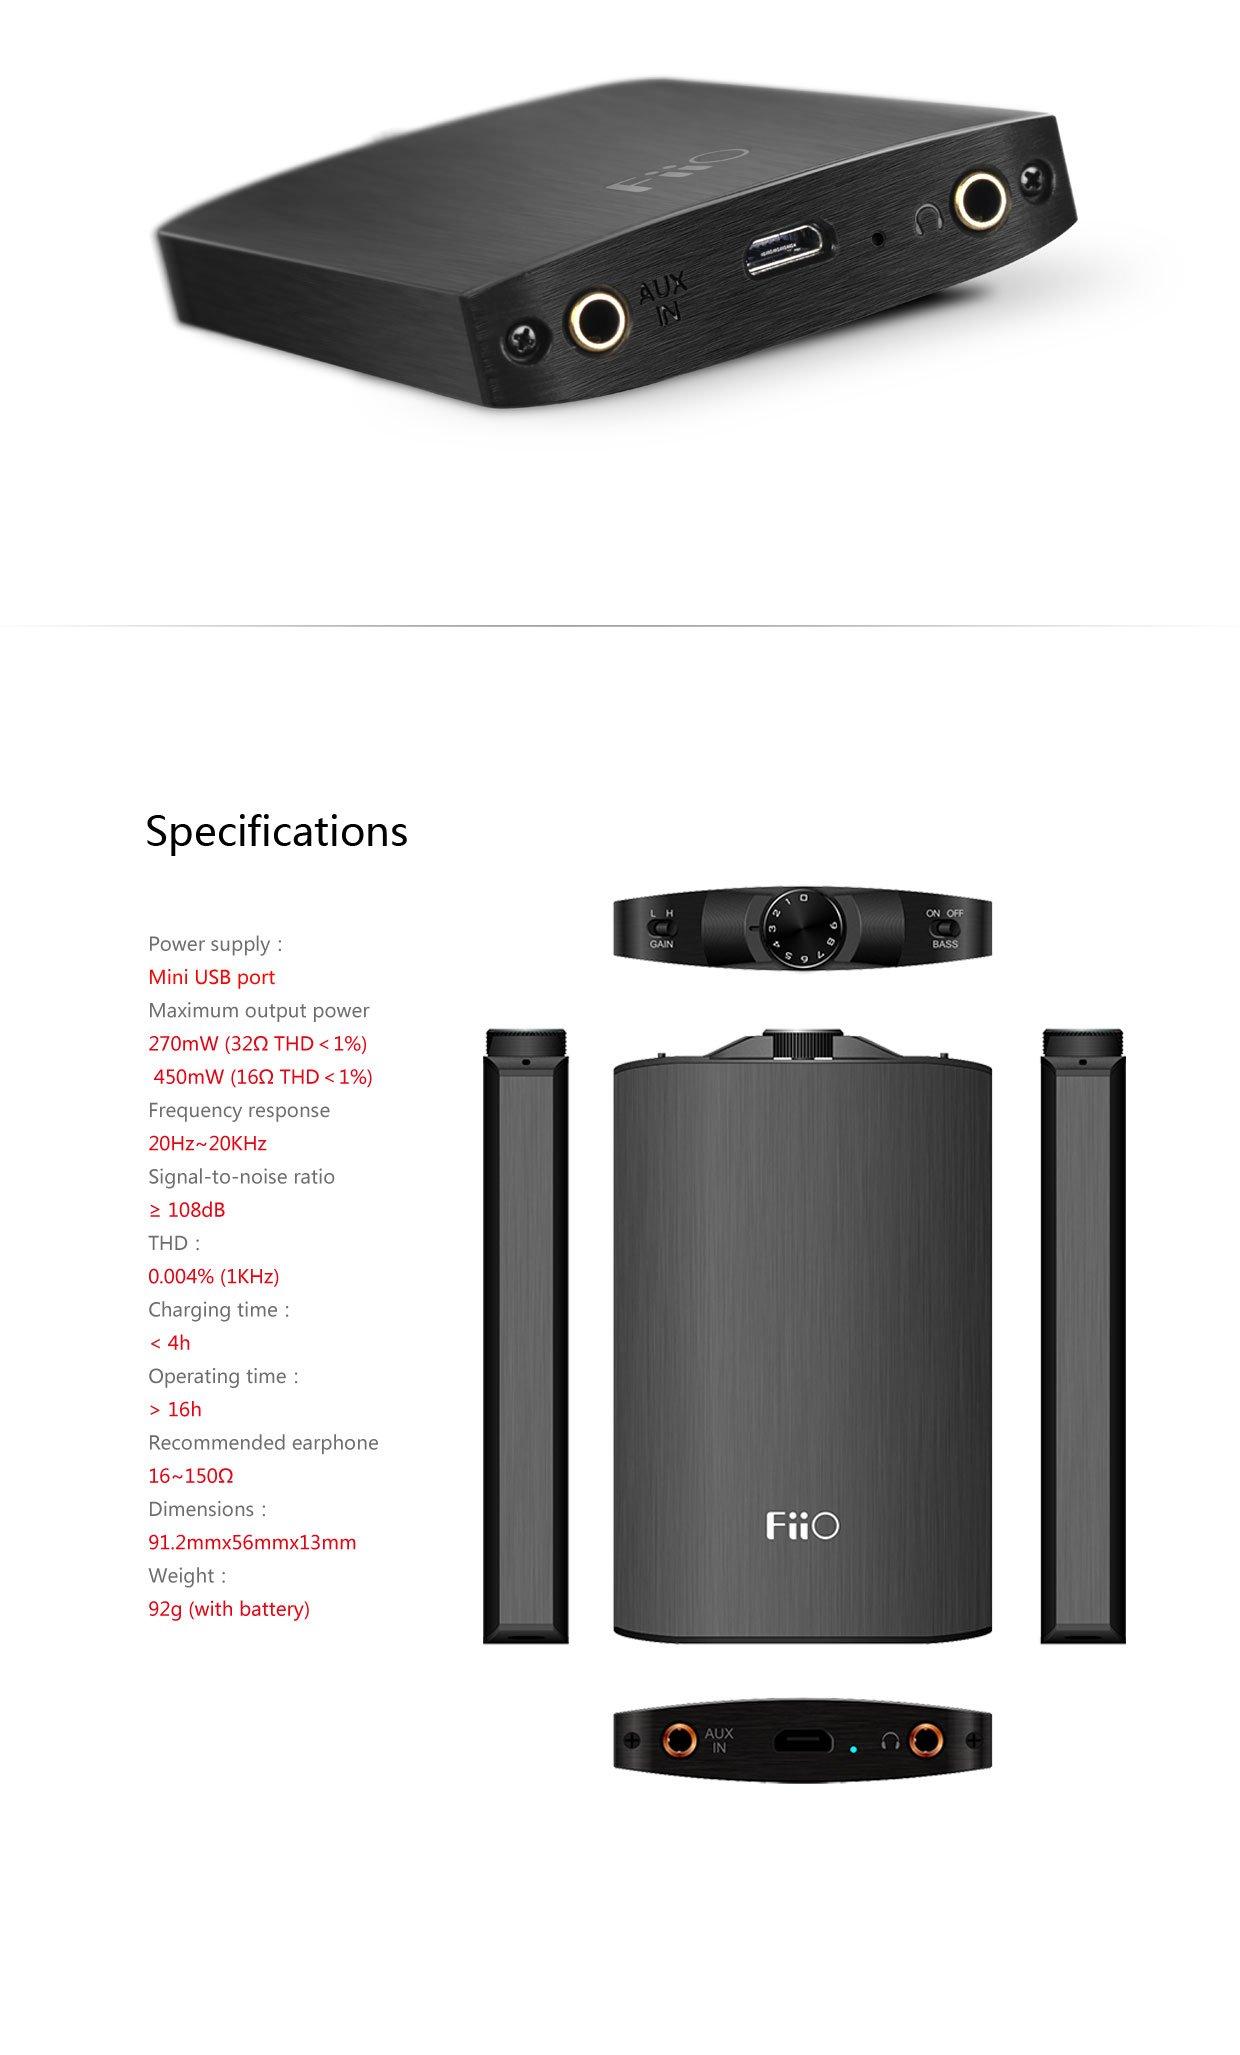 FiiO A3 (E11K E11) Kilimanjaro 2 Portable Headphone Amplifier with Extreme Audio 3.5mm Stereo to RCA Cable by FiiO (Image #4)